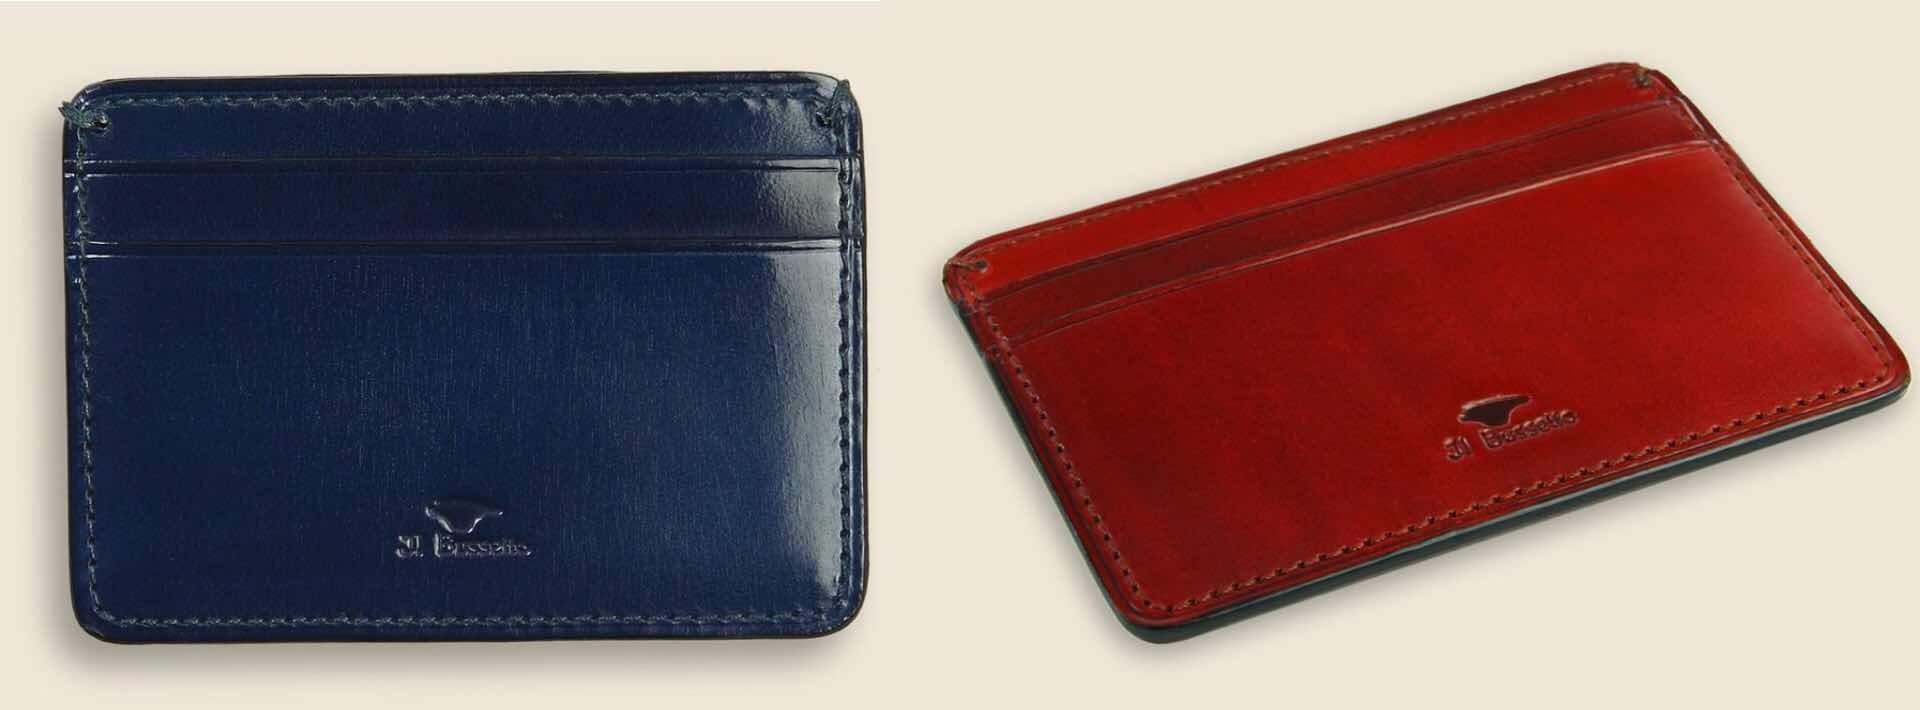 Il Bussetto Credit Card Case. ($48)